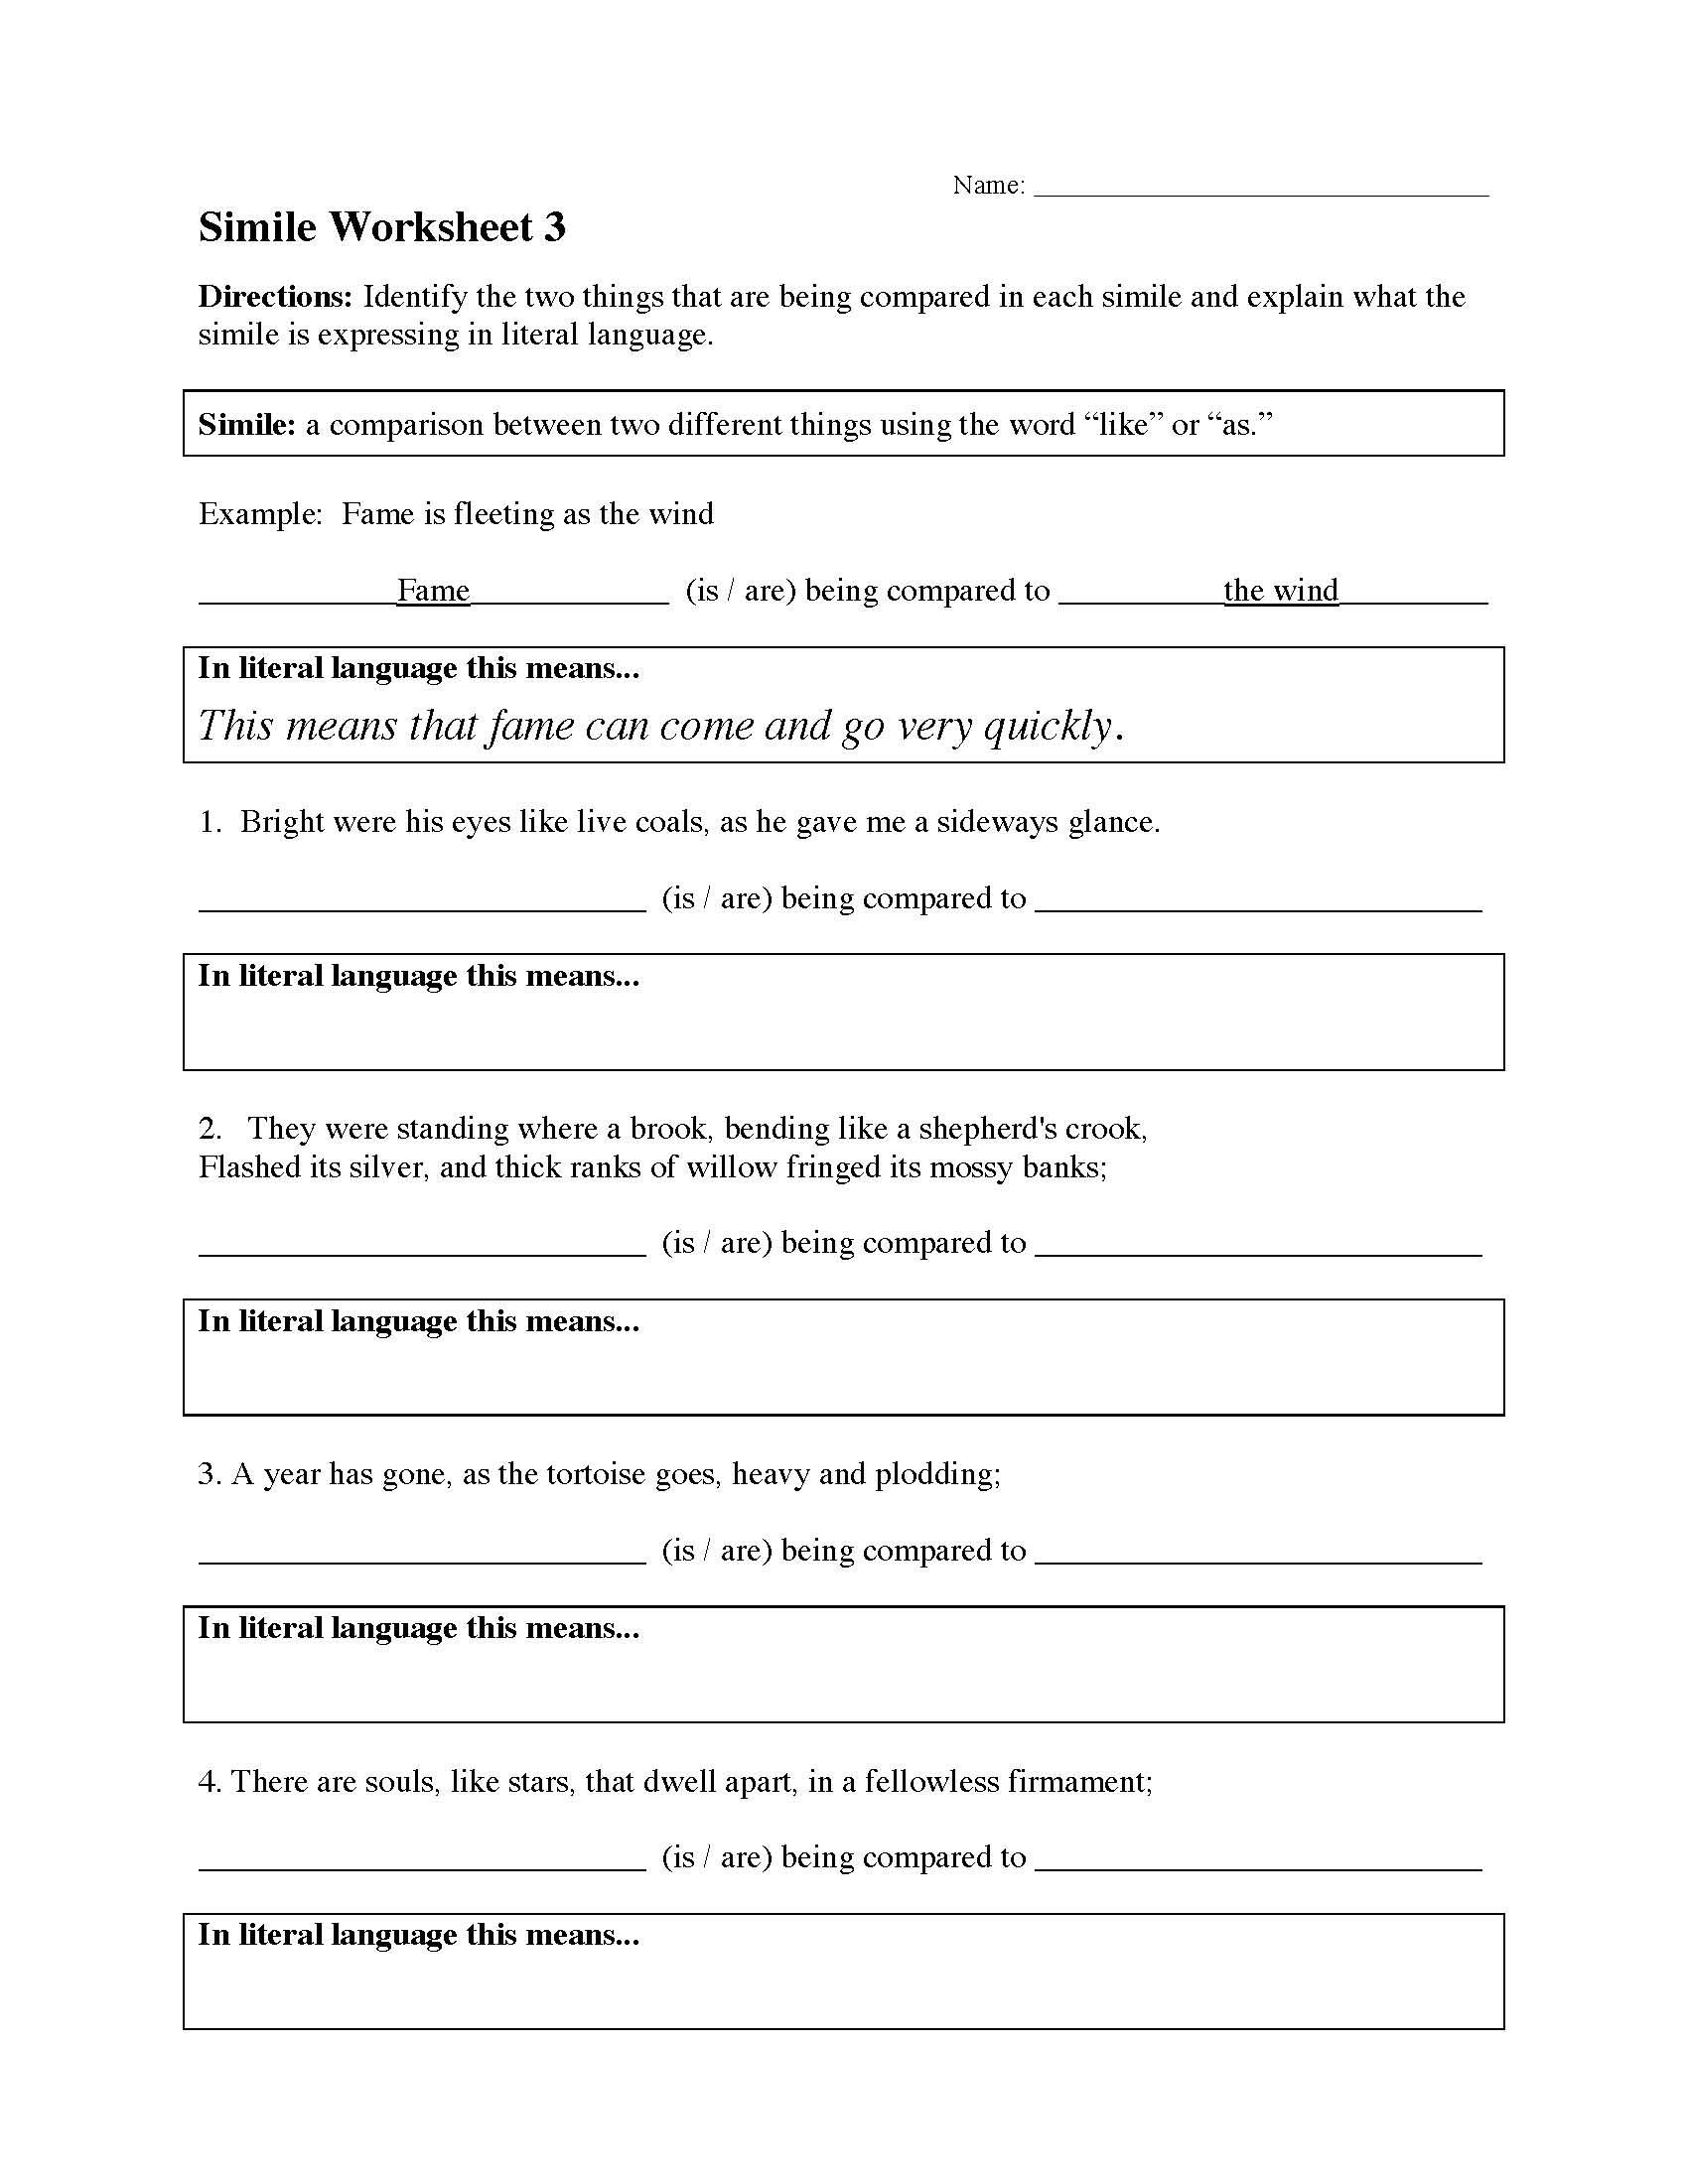 Simile Worksheet 3